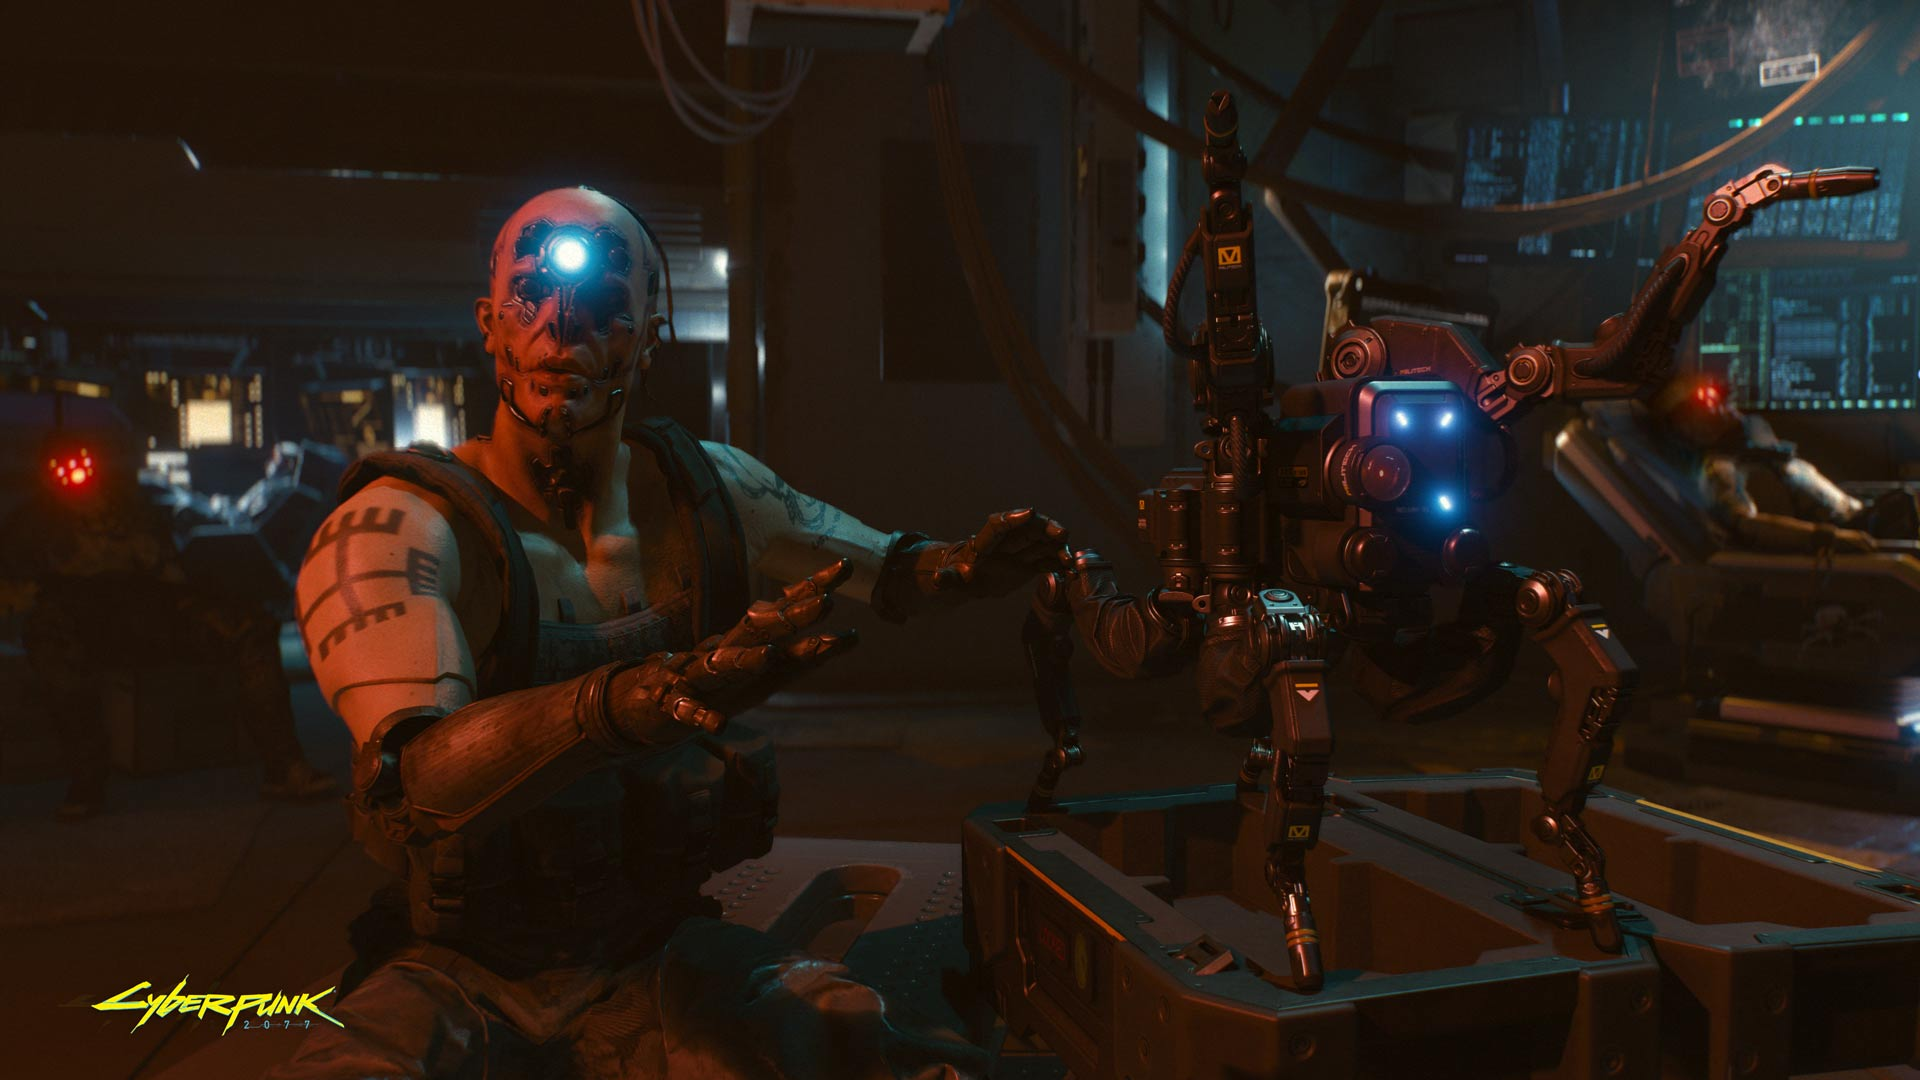 Cyberpunk 2077 The hottest tech in town